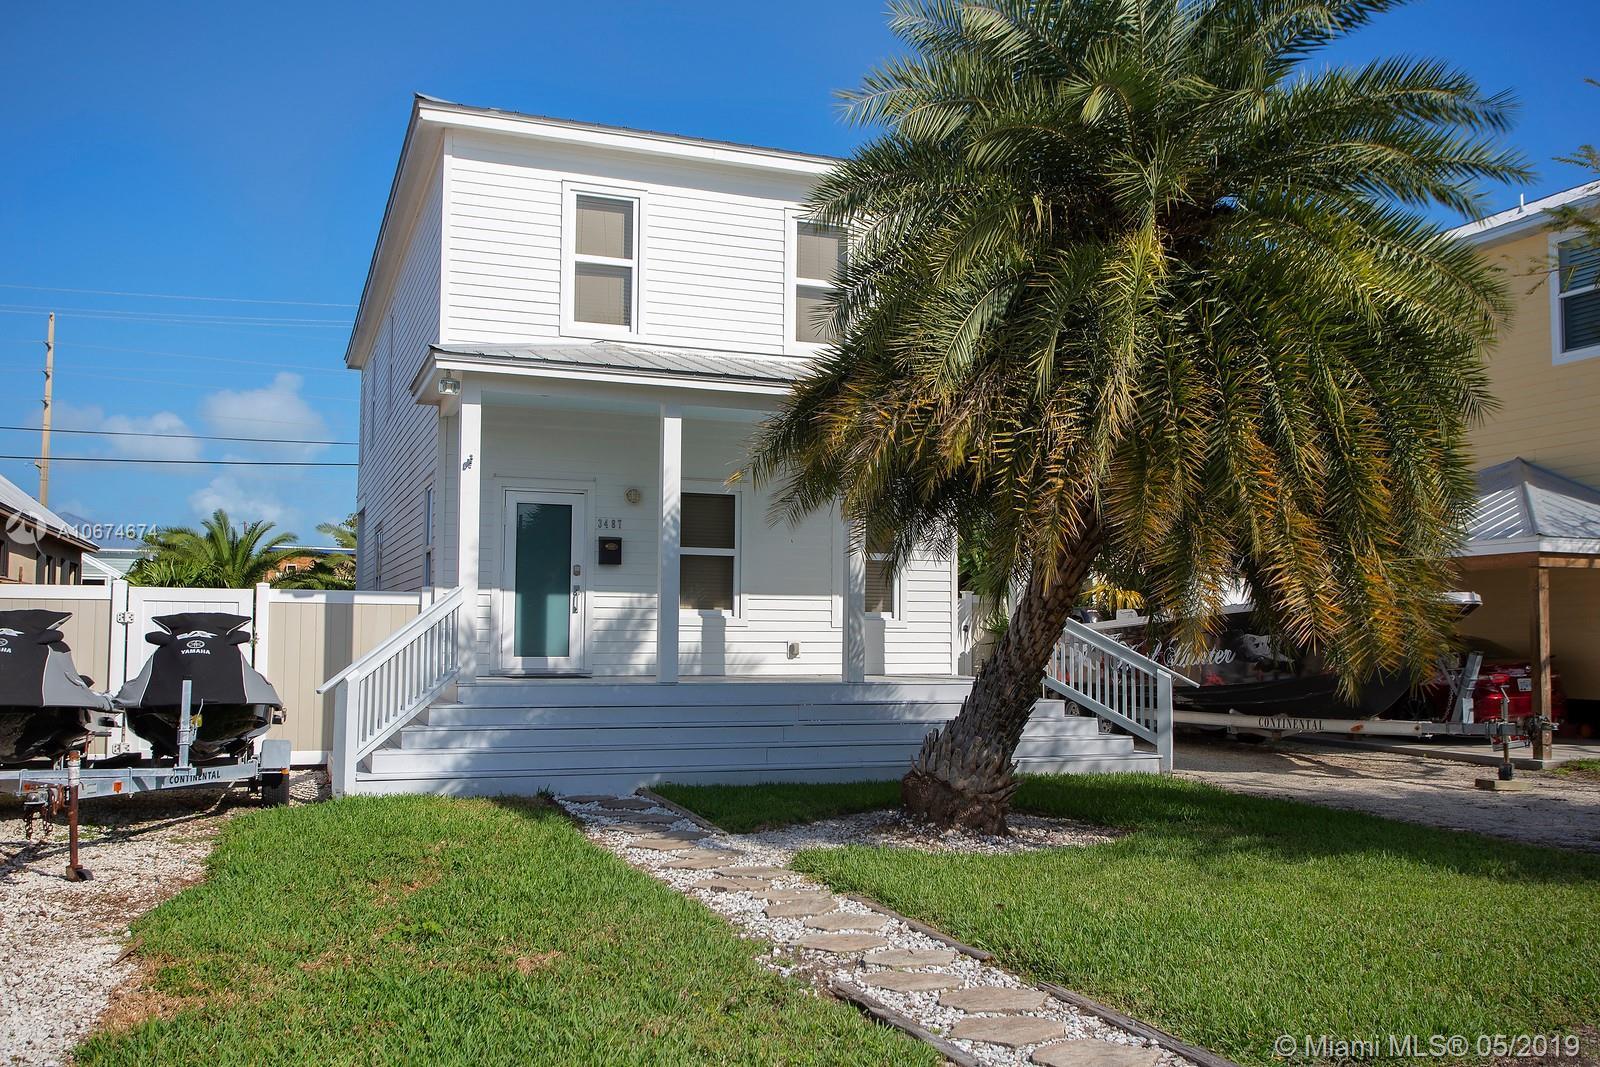 3487 Eagle Ave, Other City - Keys/Islands/Caribbean, FL 33040